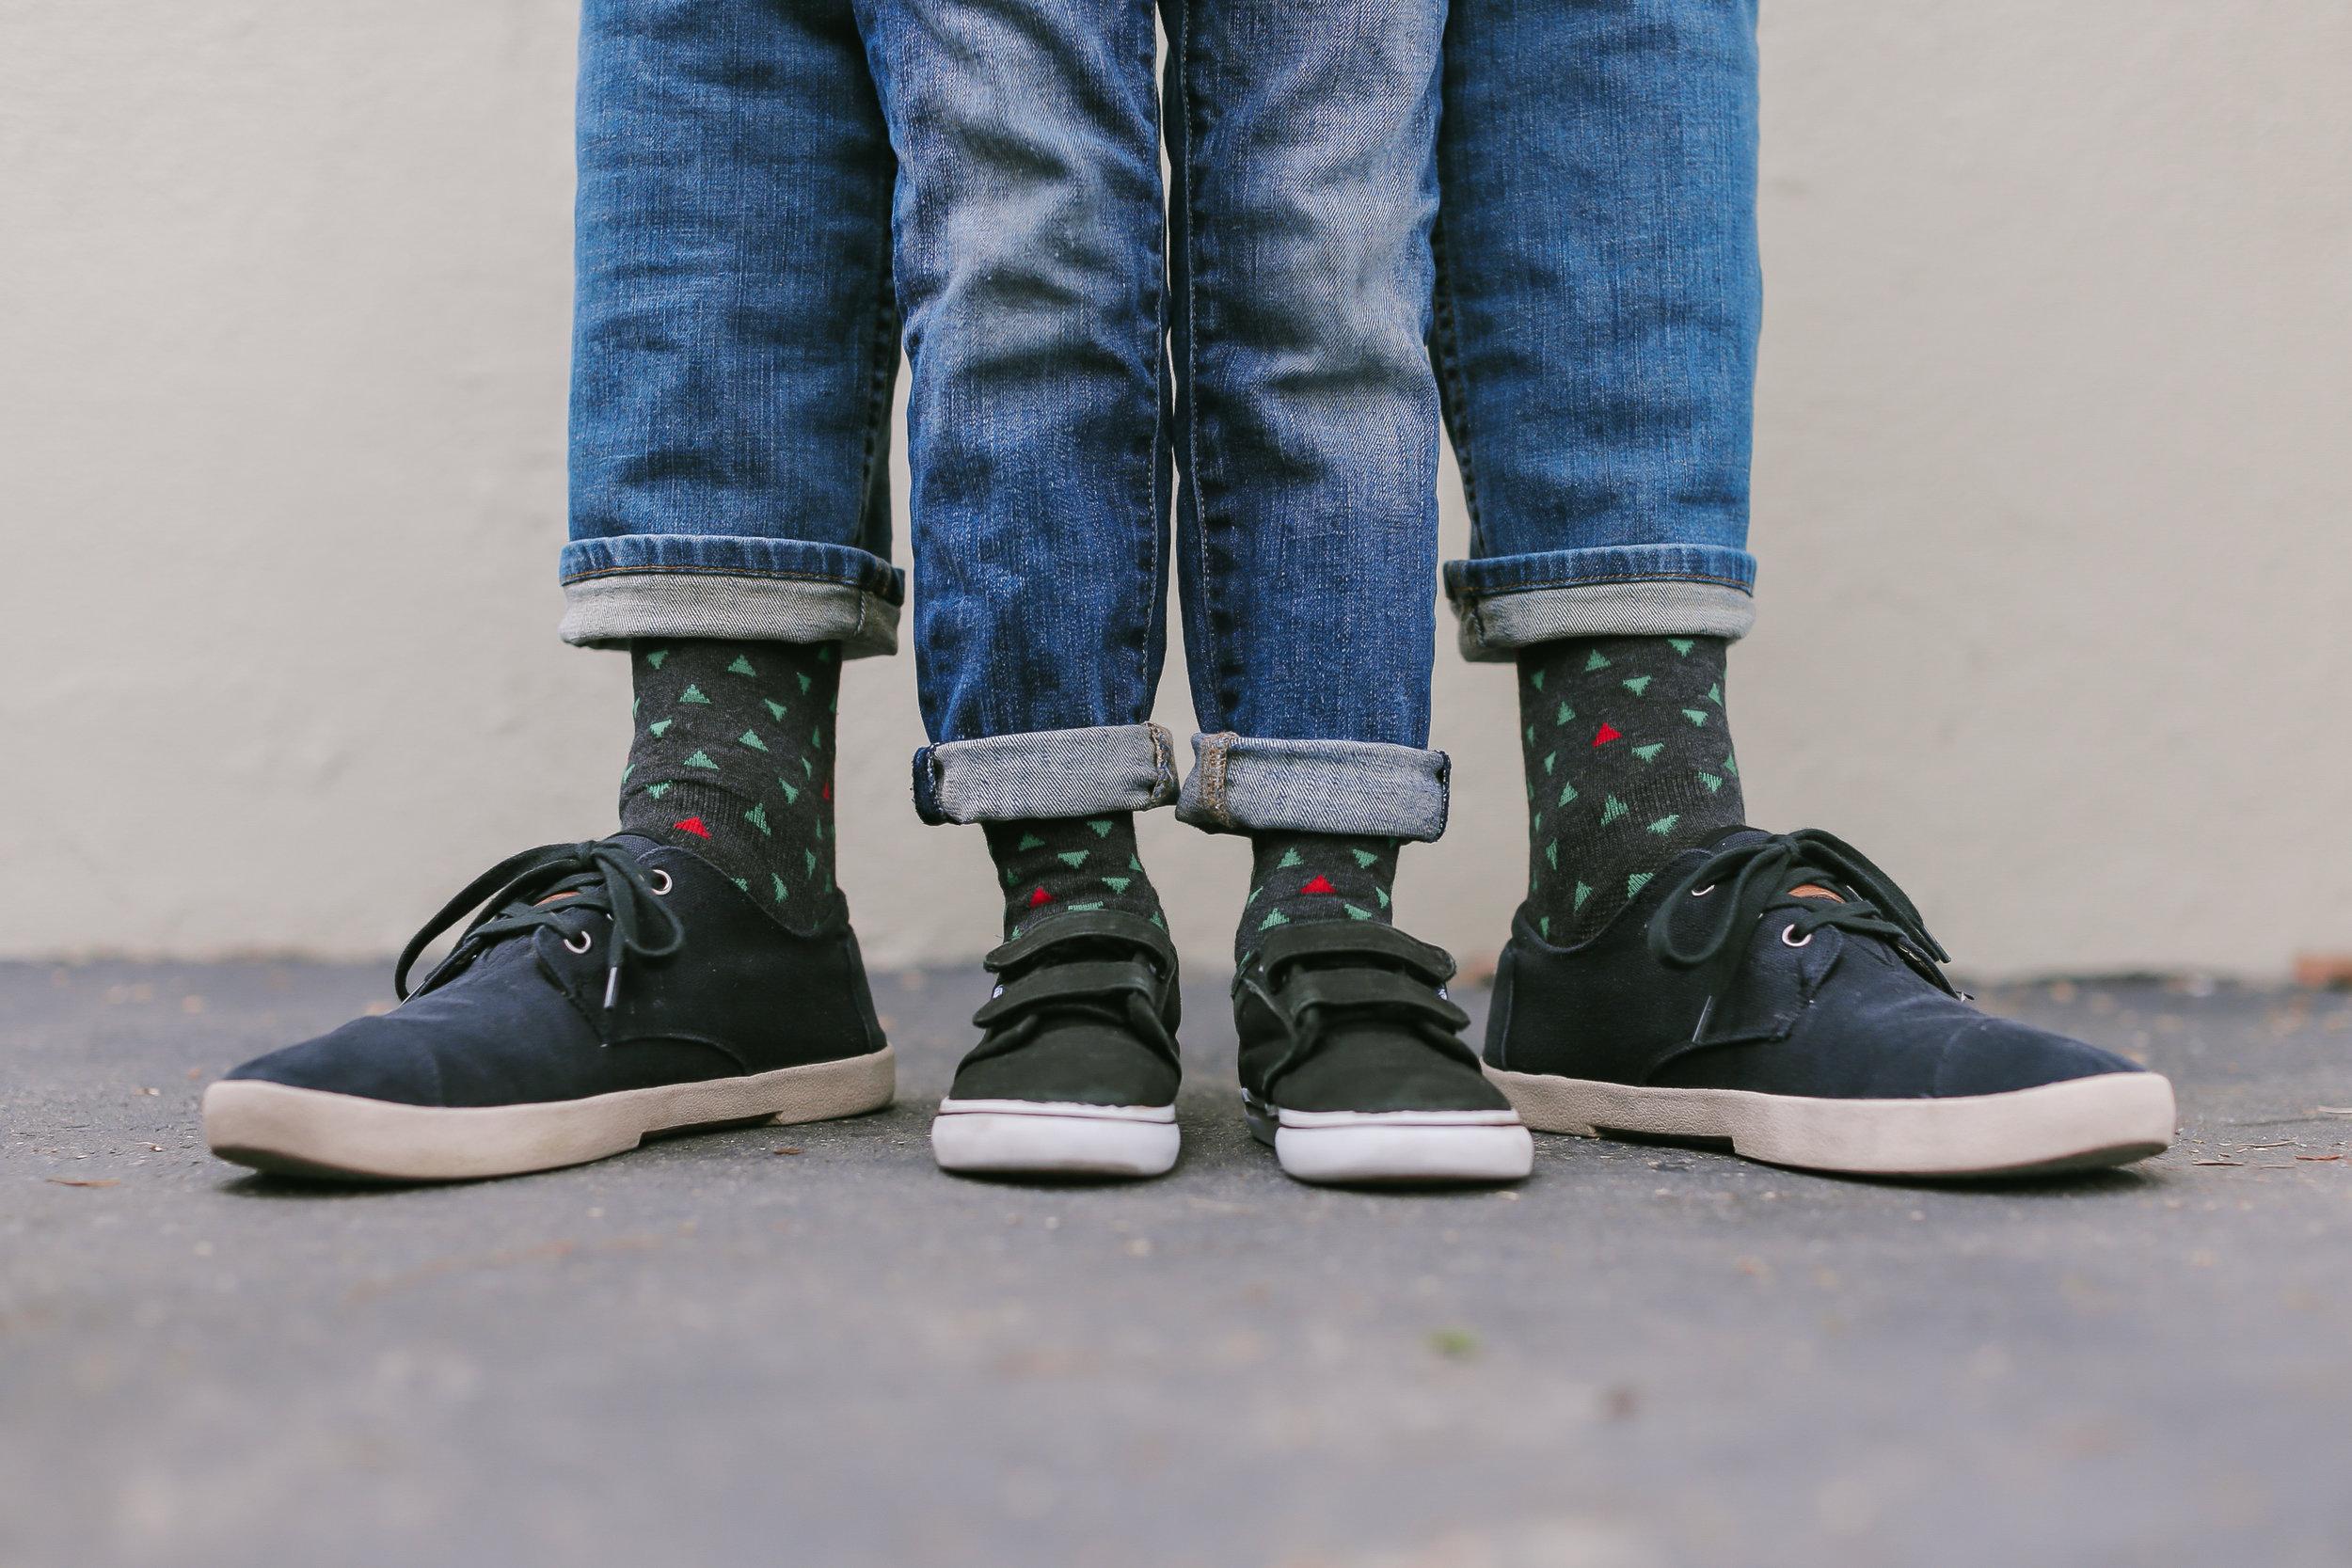 2014-POT-Socks-003.jpg